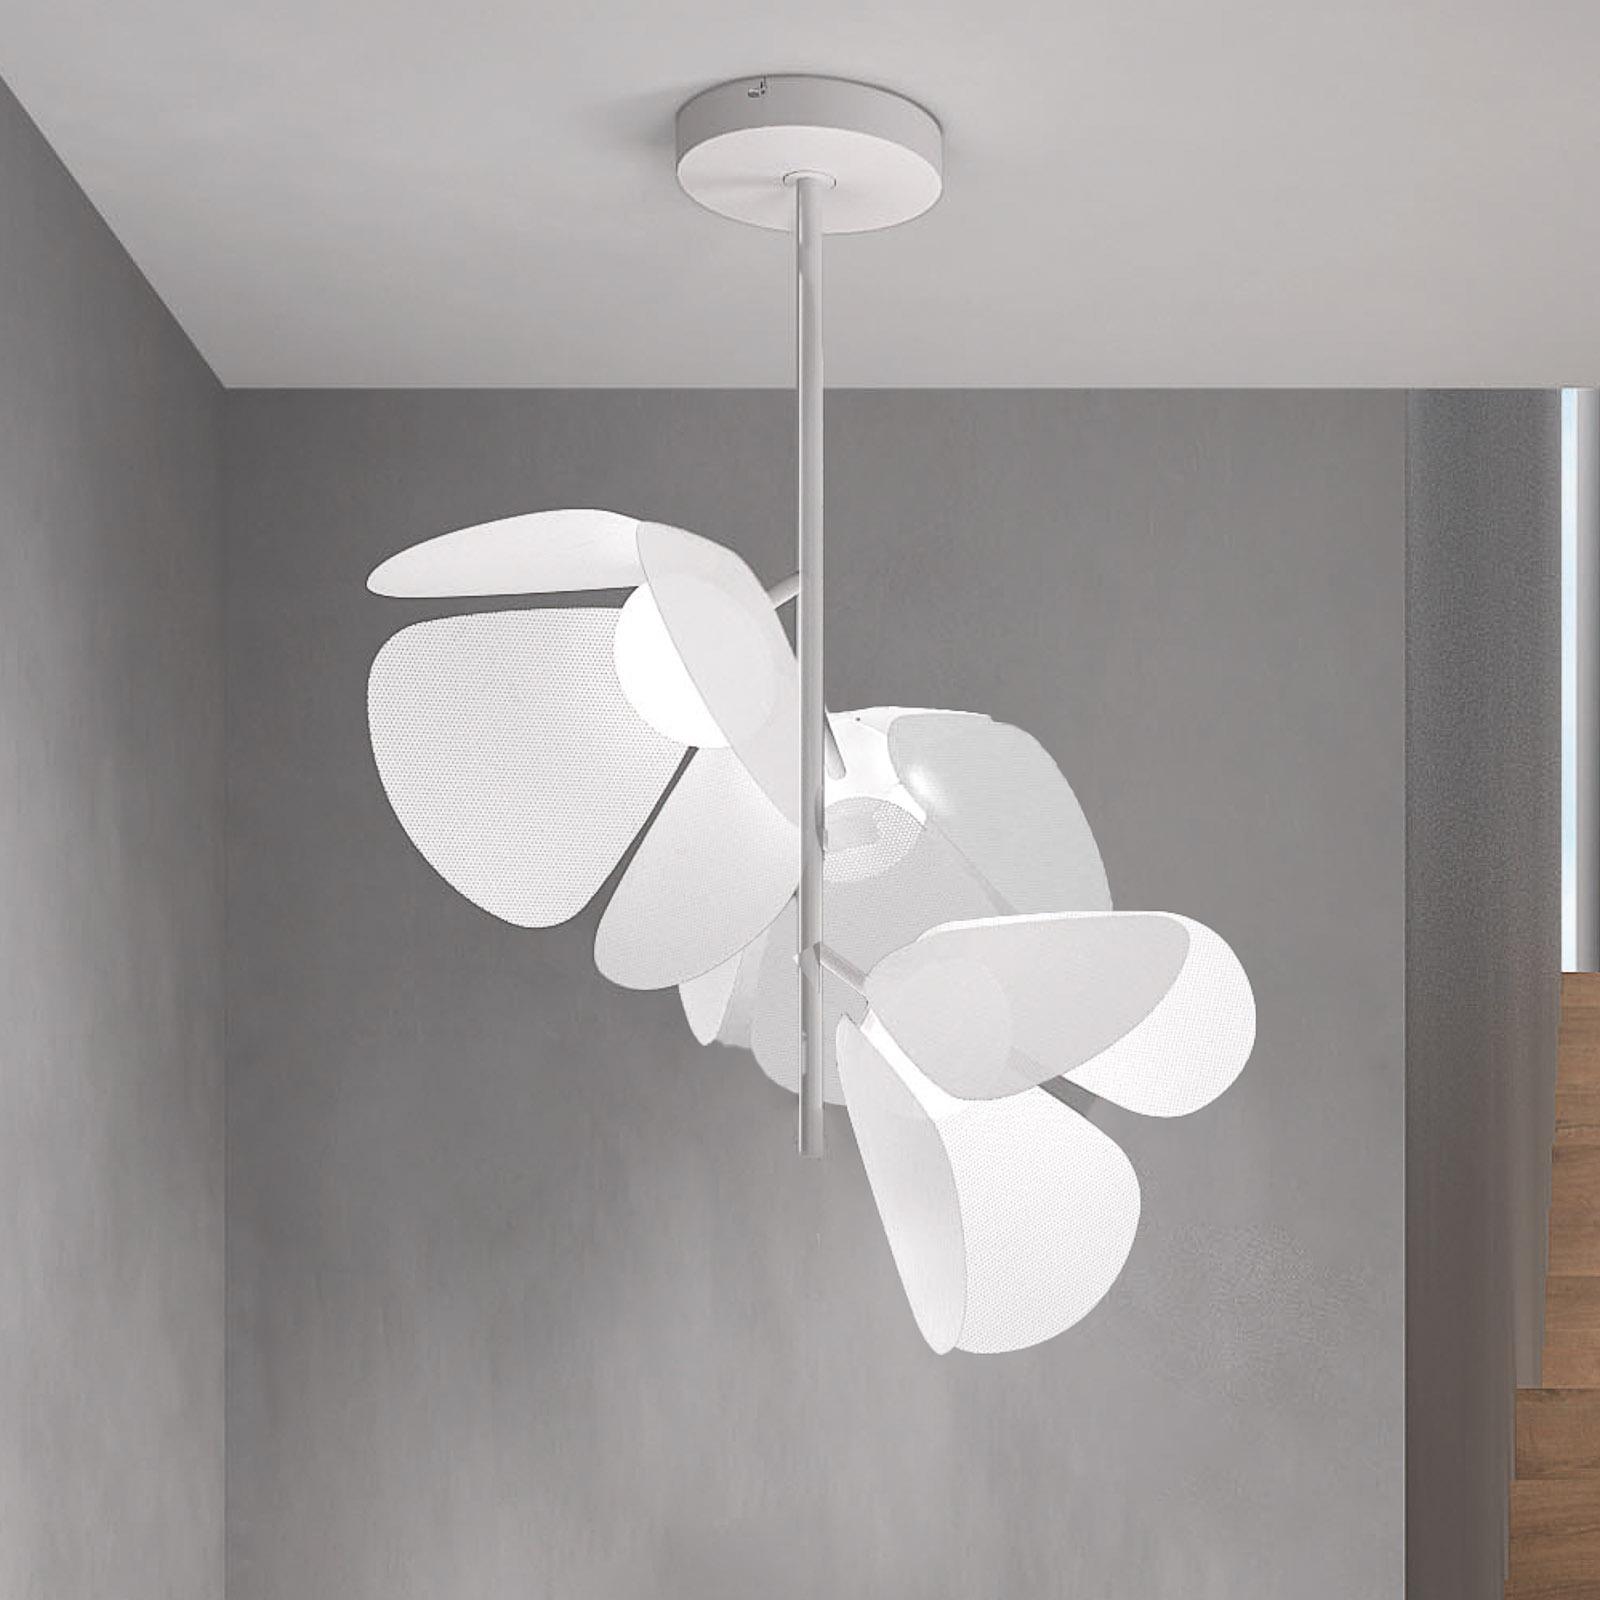 Bover Mod PF/73/3L LED-Deckenleuchte, weiß